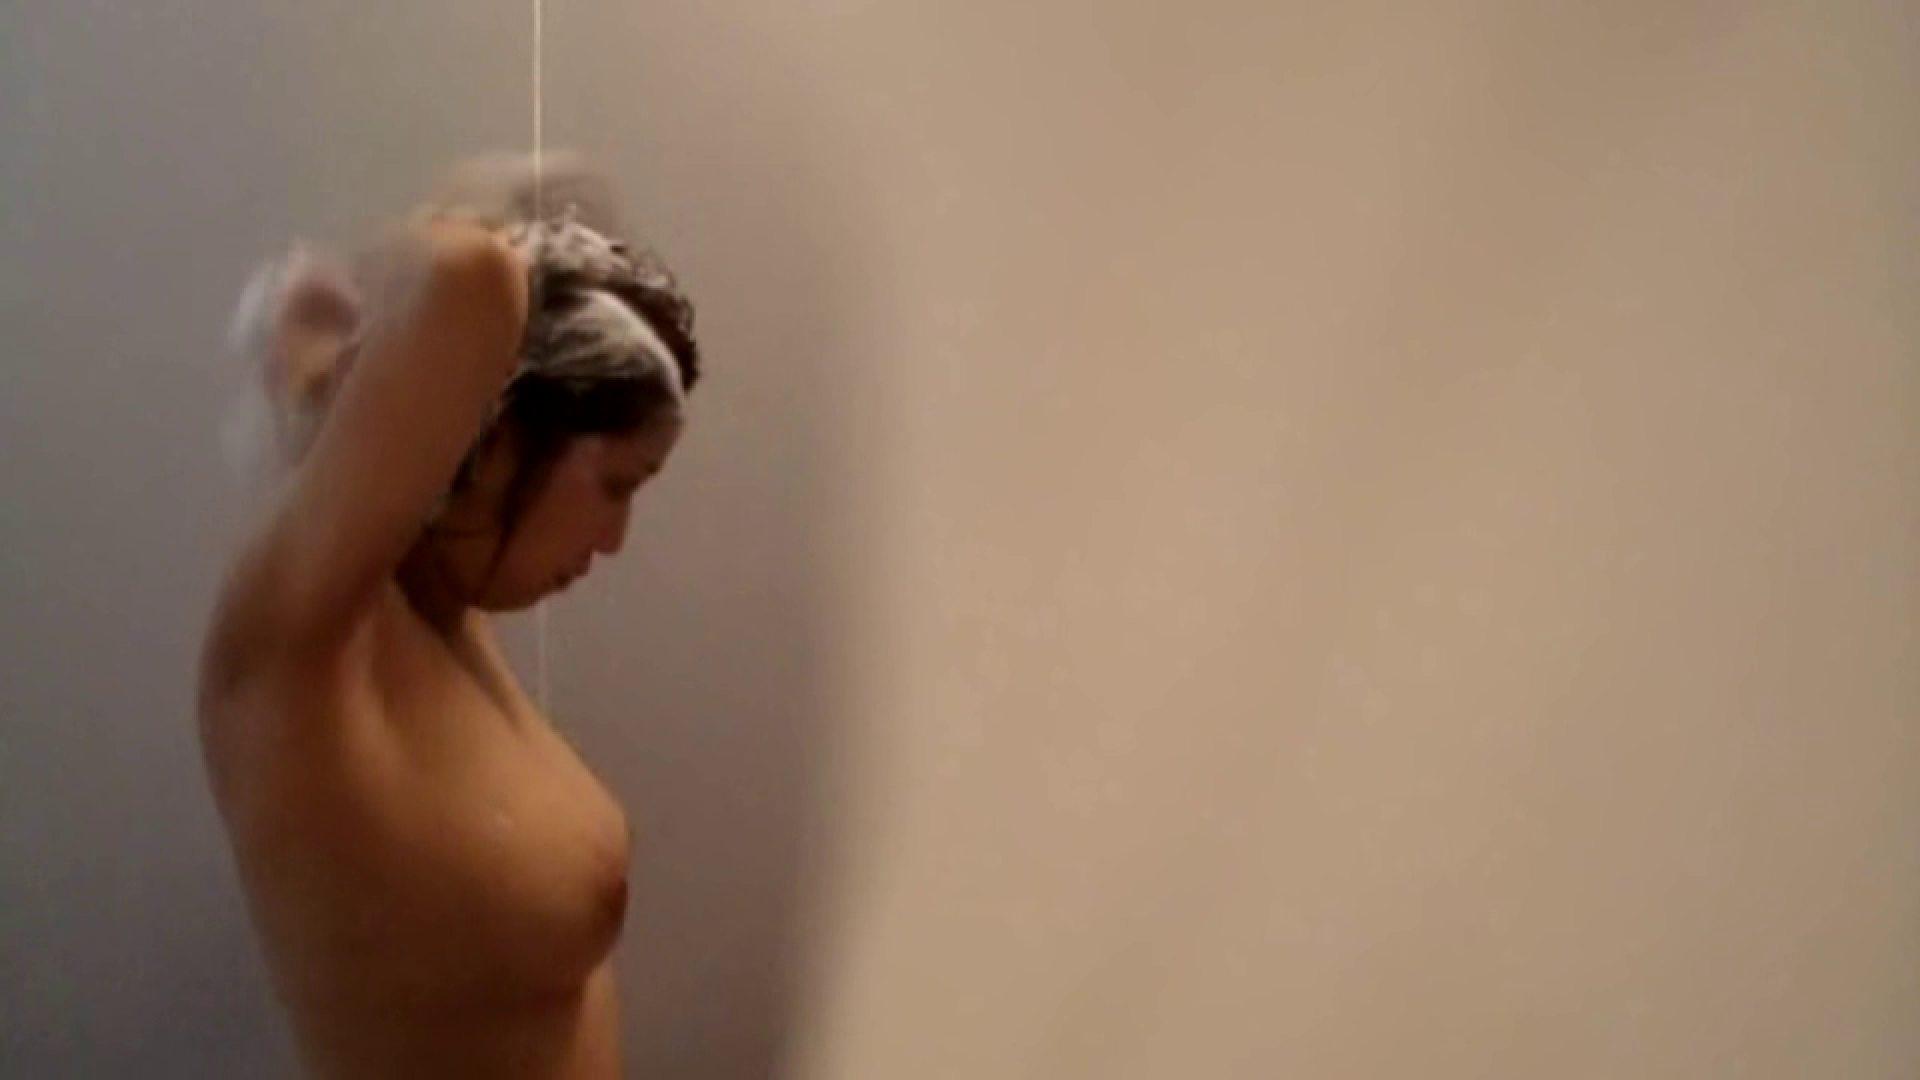 vol.2 葵のグラドル顔負けの爆乳を入浴シーンでどうぞ。 入浴中の女性 盗み撮り動画キャプチャ 64PIX 38